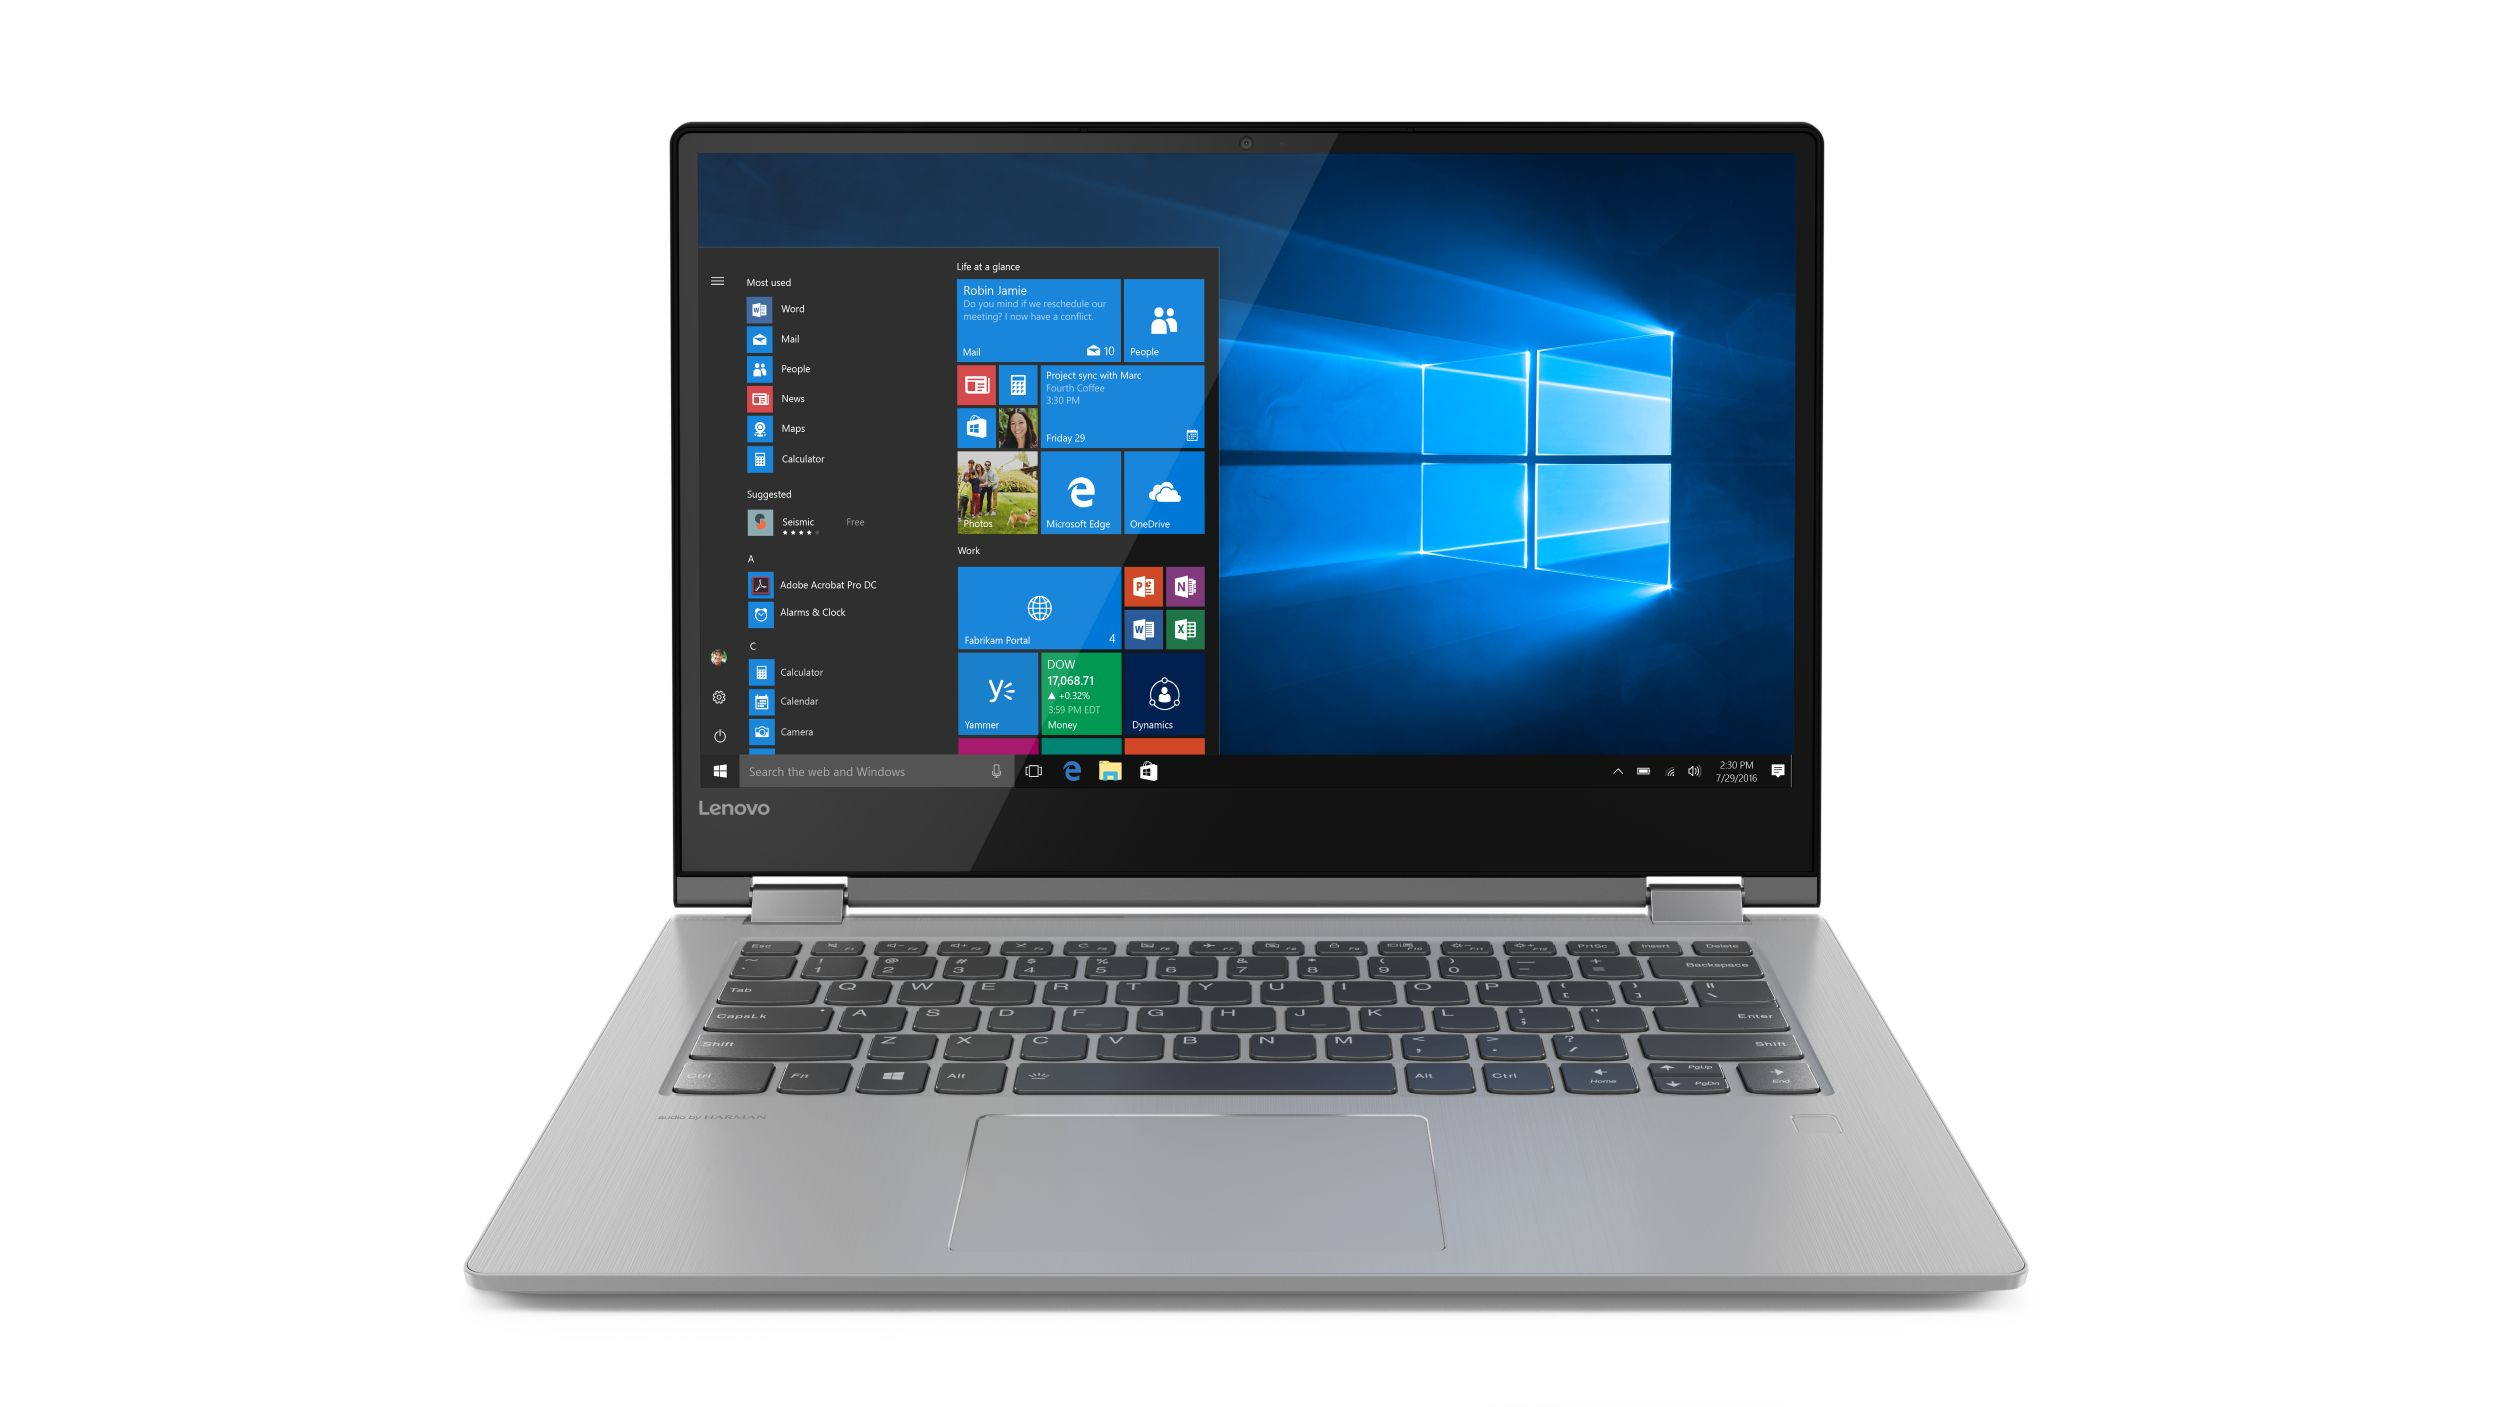 "Lenovo YOGA 530-14ARR Ryzen 3 2200U 3,70GHz/4GB/SSD 128GB/14"" FHD/IPS/touch/ActivePen/FPR/WIN10 černá 81H90009CK"